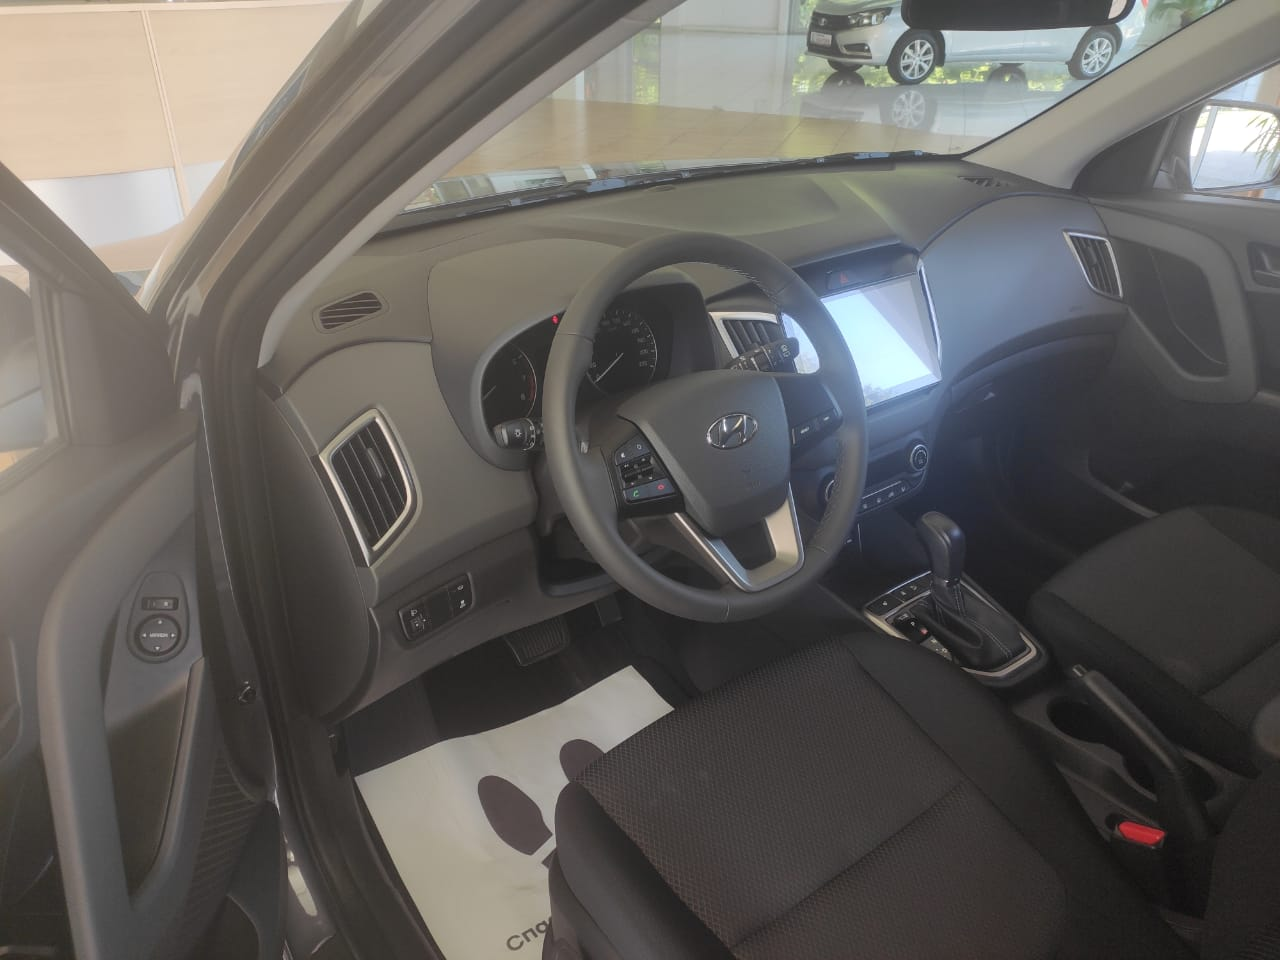 HYUNDAI CRETA 2.0л 6AT 2WD Comfort + пакет Winter, Серый, 2021